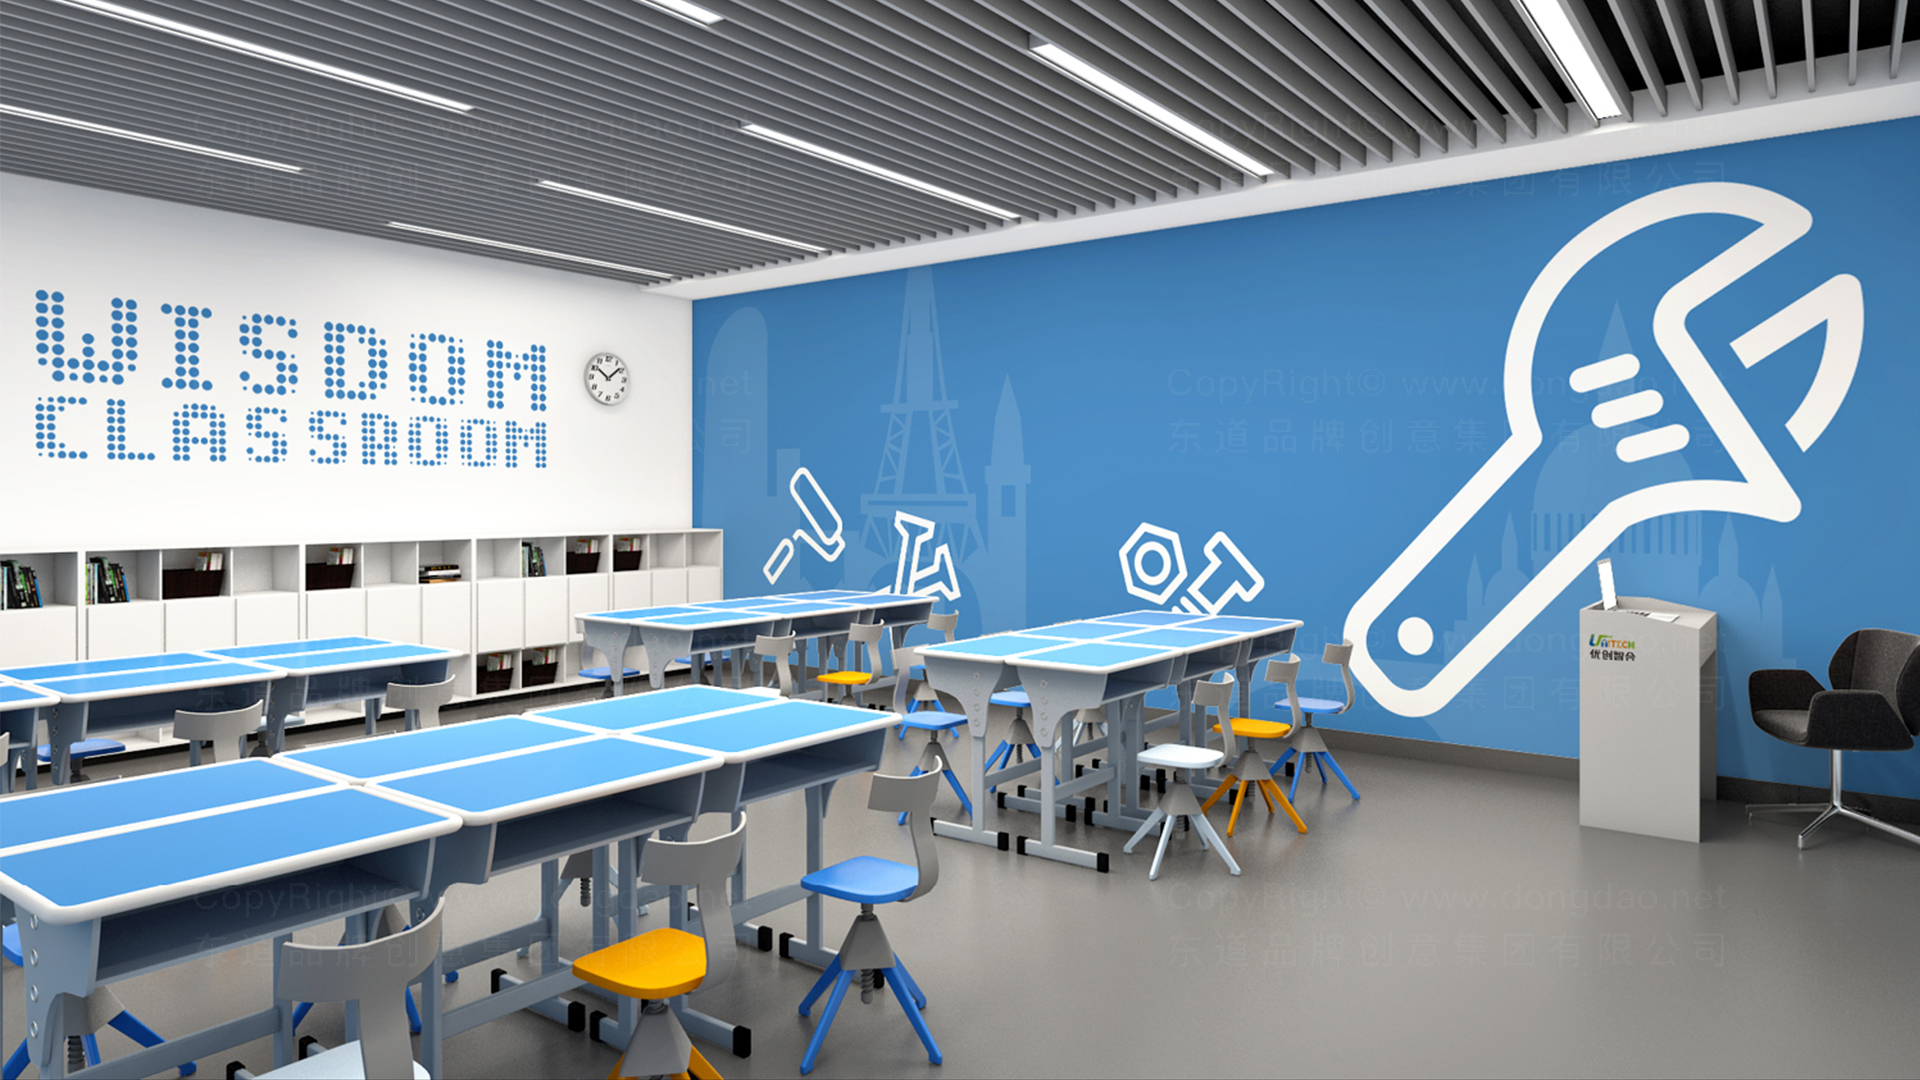 IT通讯商业空间&导示优创智合虚拟店SI平面布局图设计